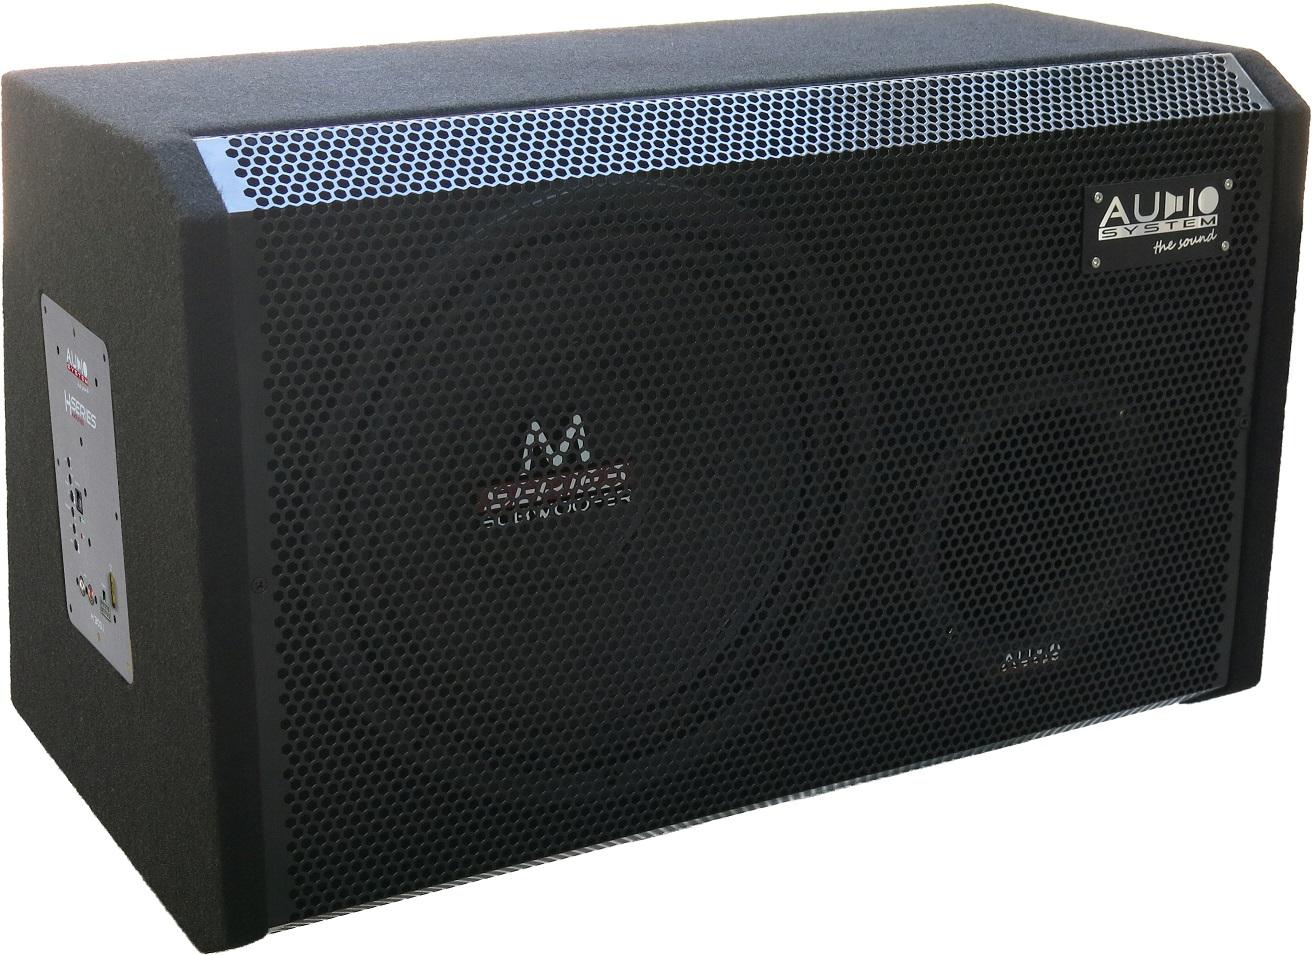 Audio System M 12 ACTIVE Bassreflexgehäuse mit M 12 + CO-200.1 Subwoofer + Monoamplifier